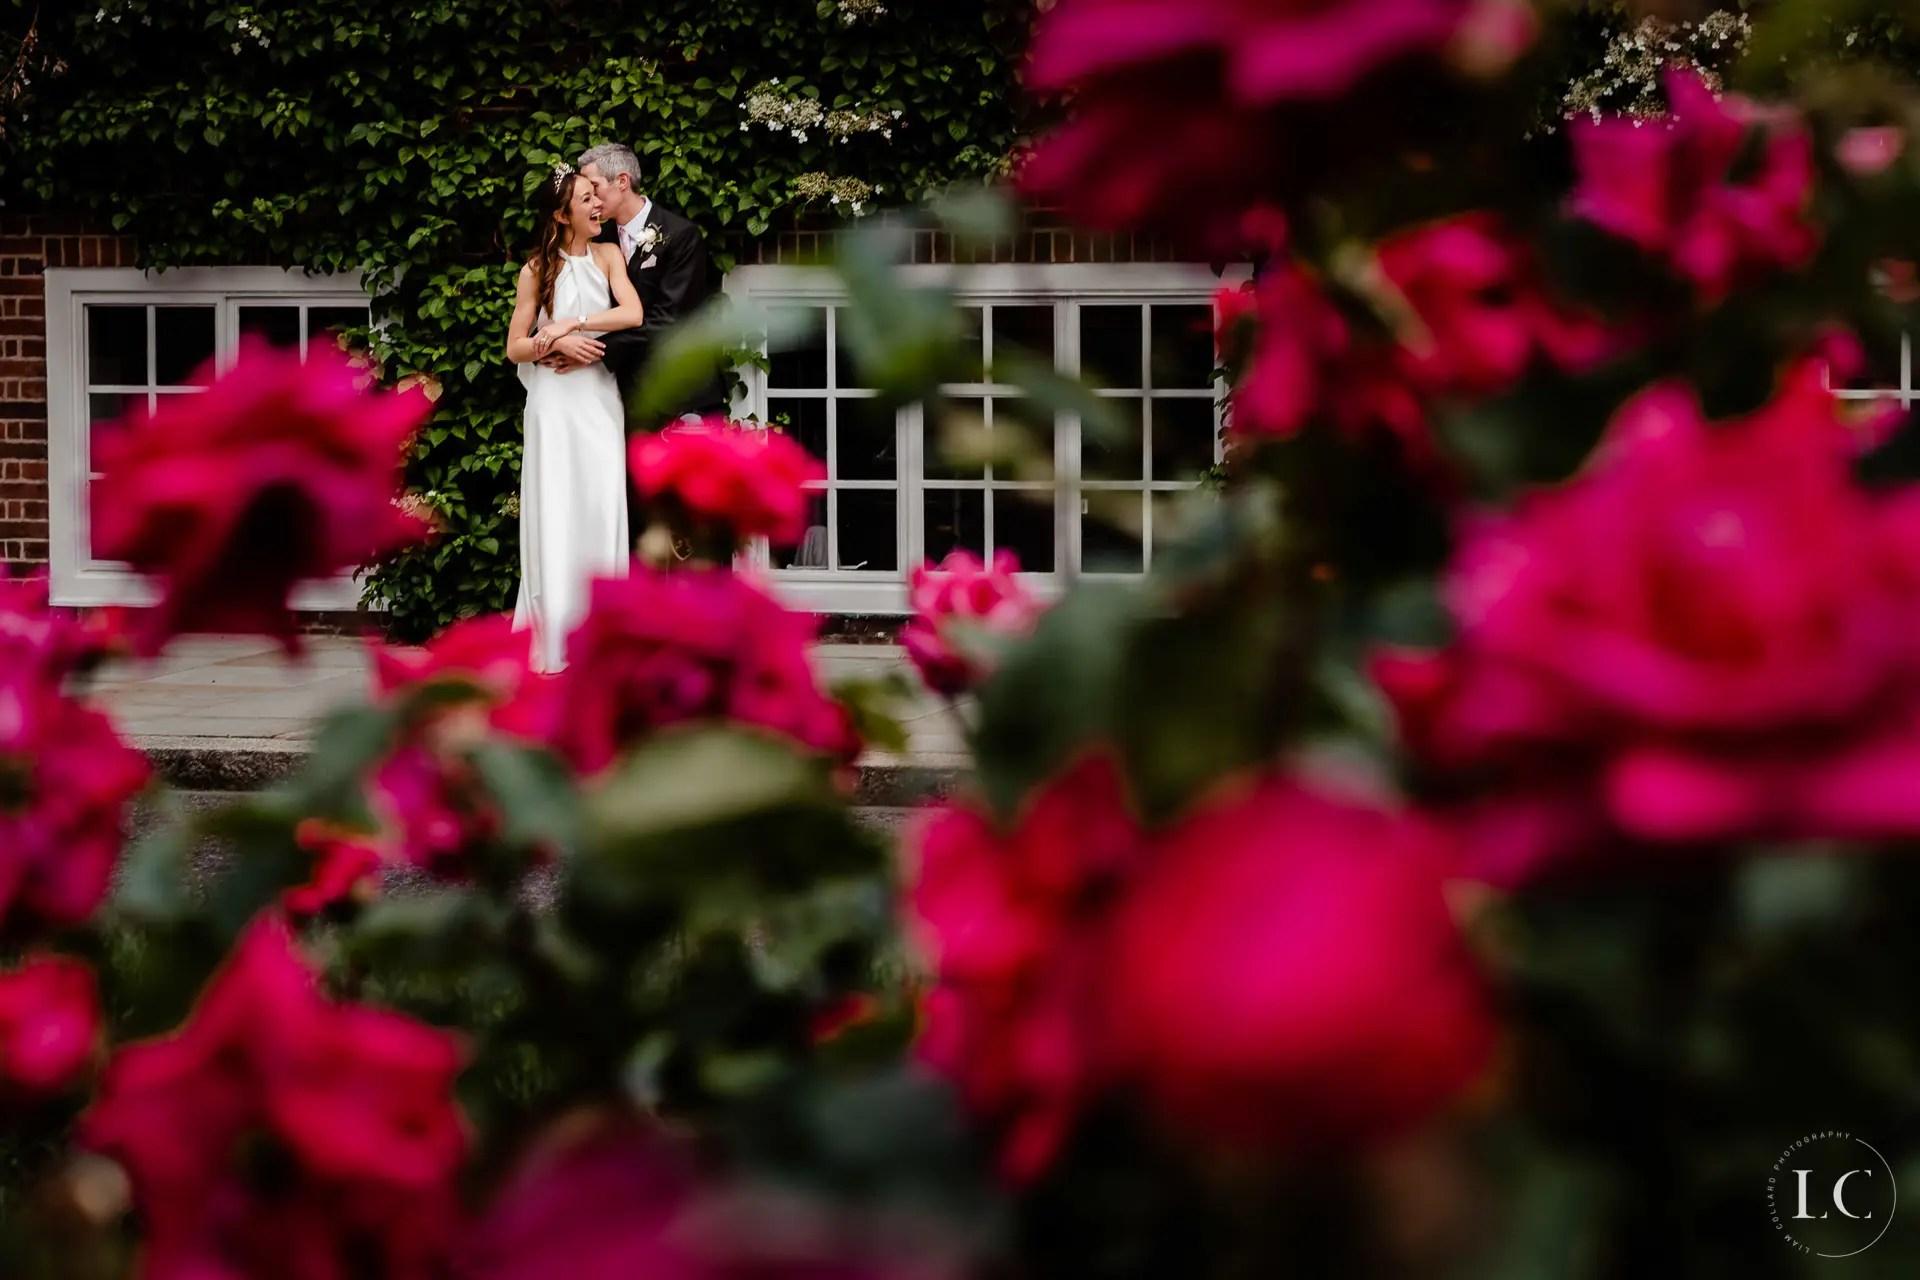 Bride and groom embracing among flowers